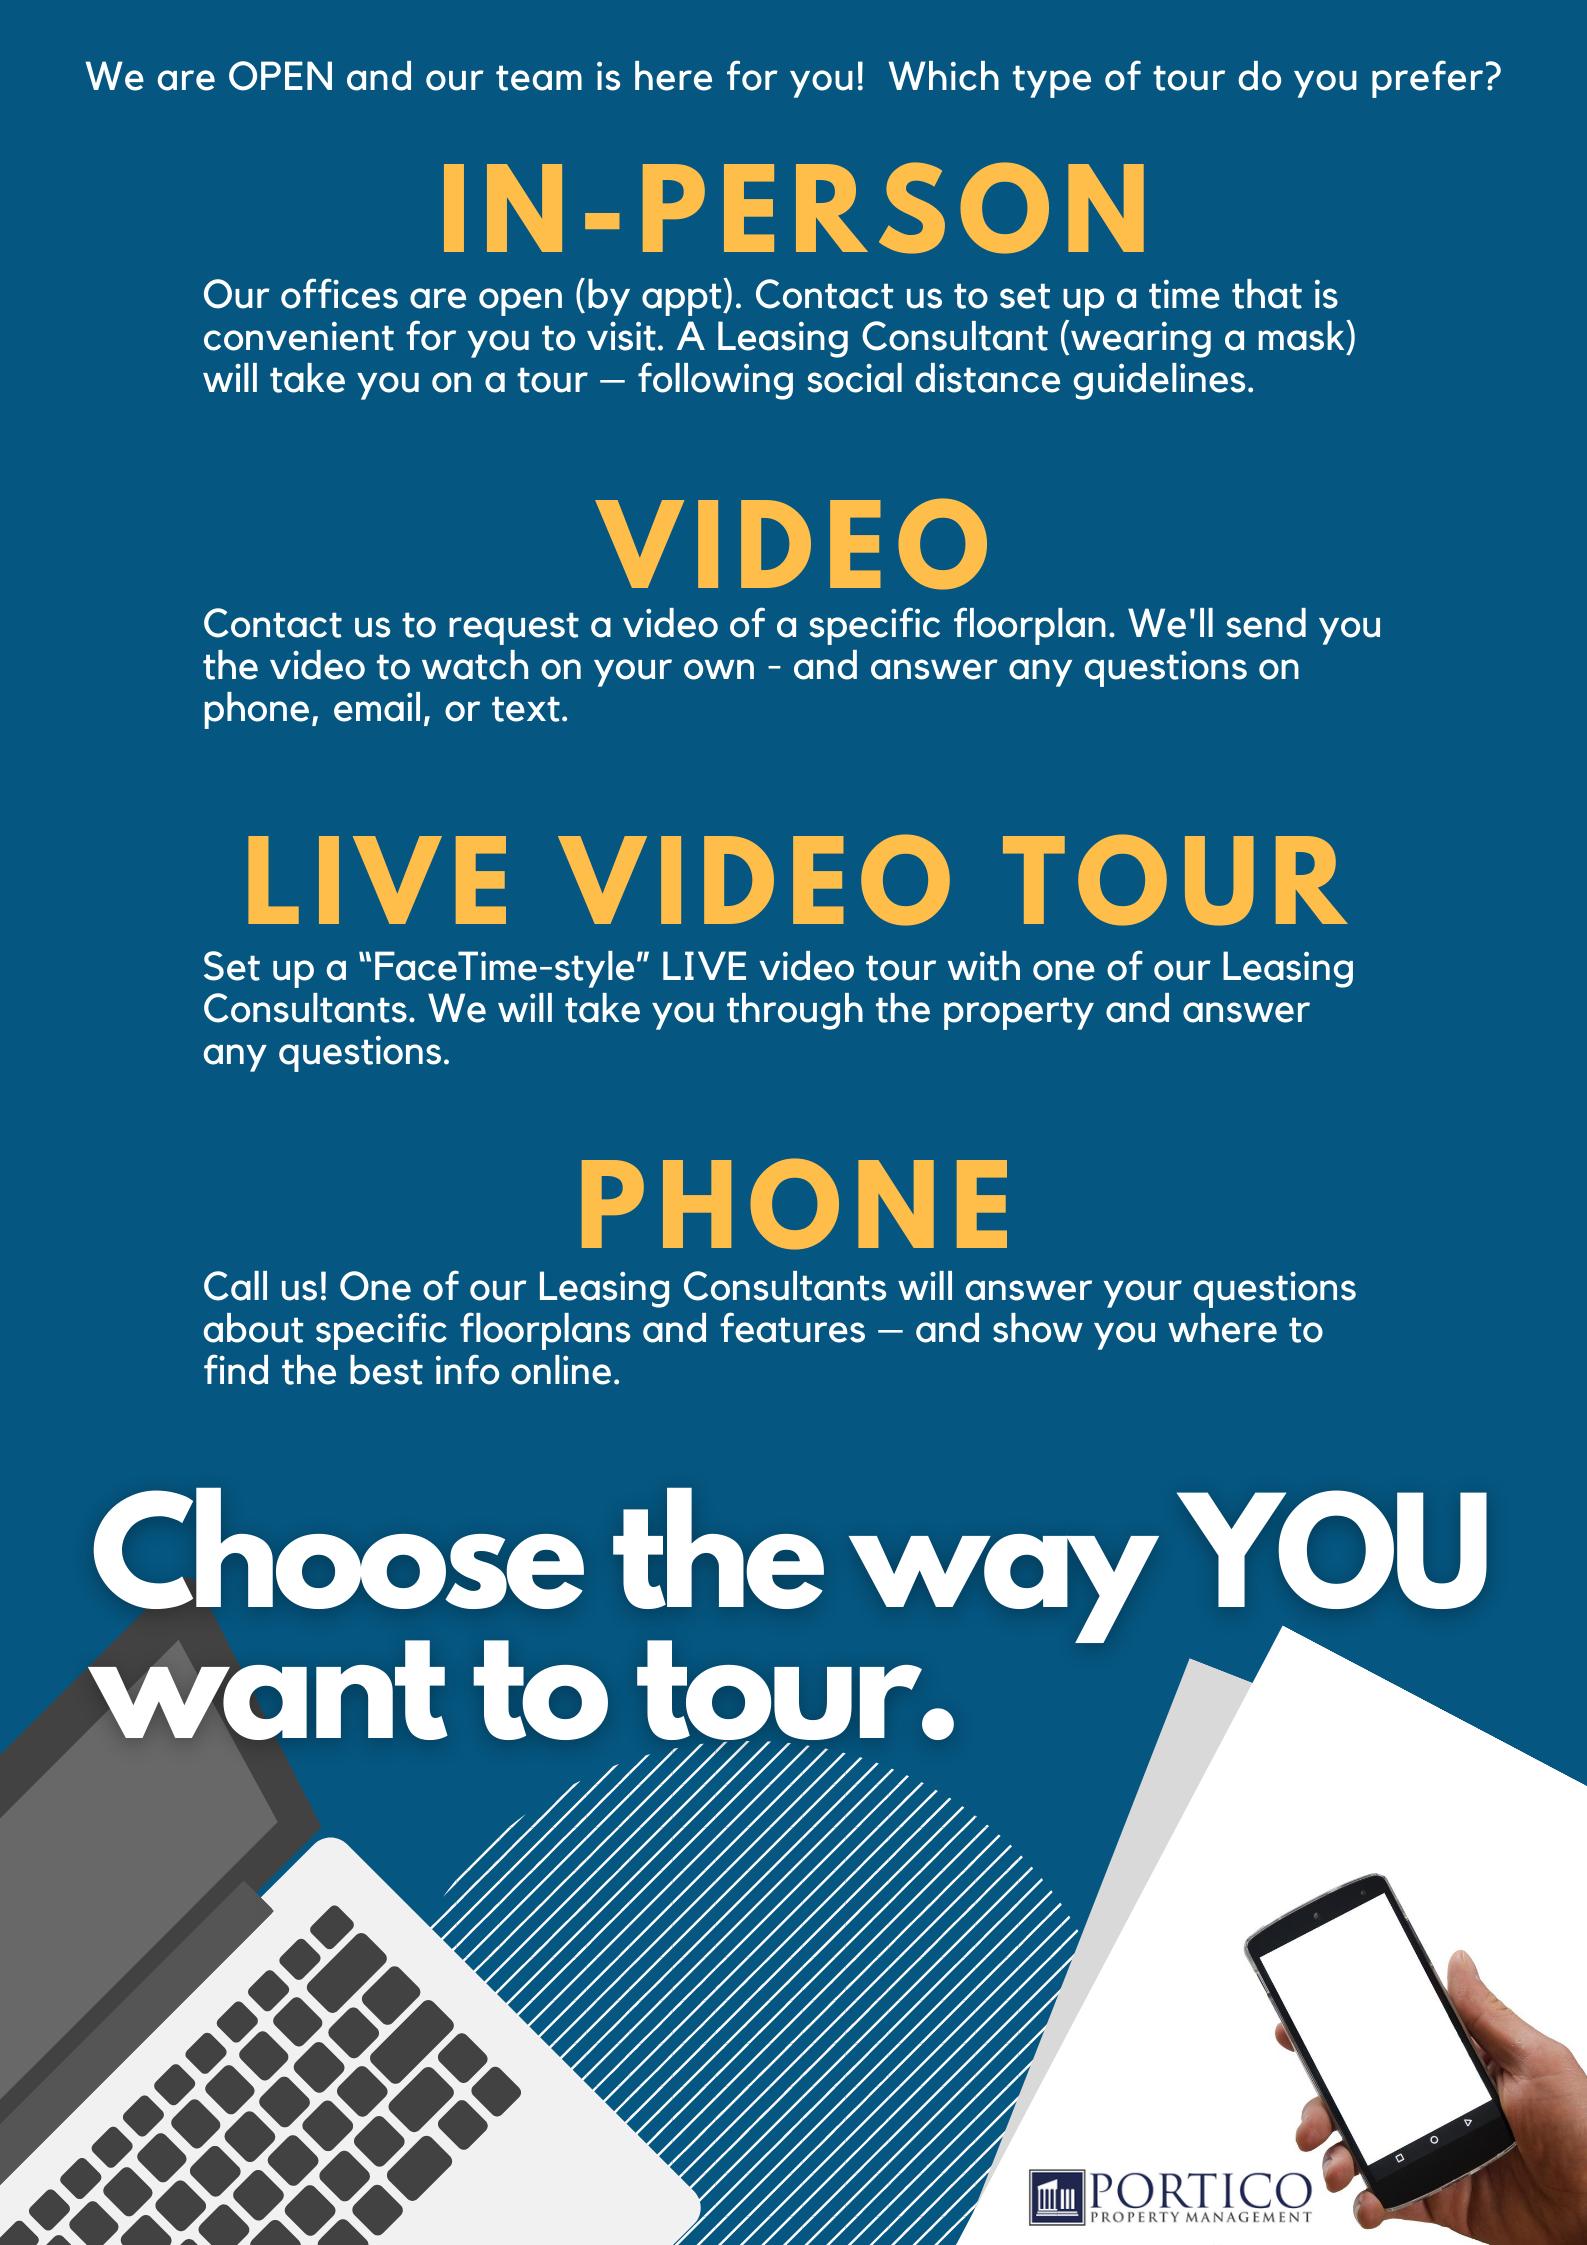 Tour Options at Heritage Village Residences in Hurst, TX